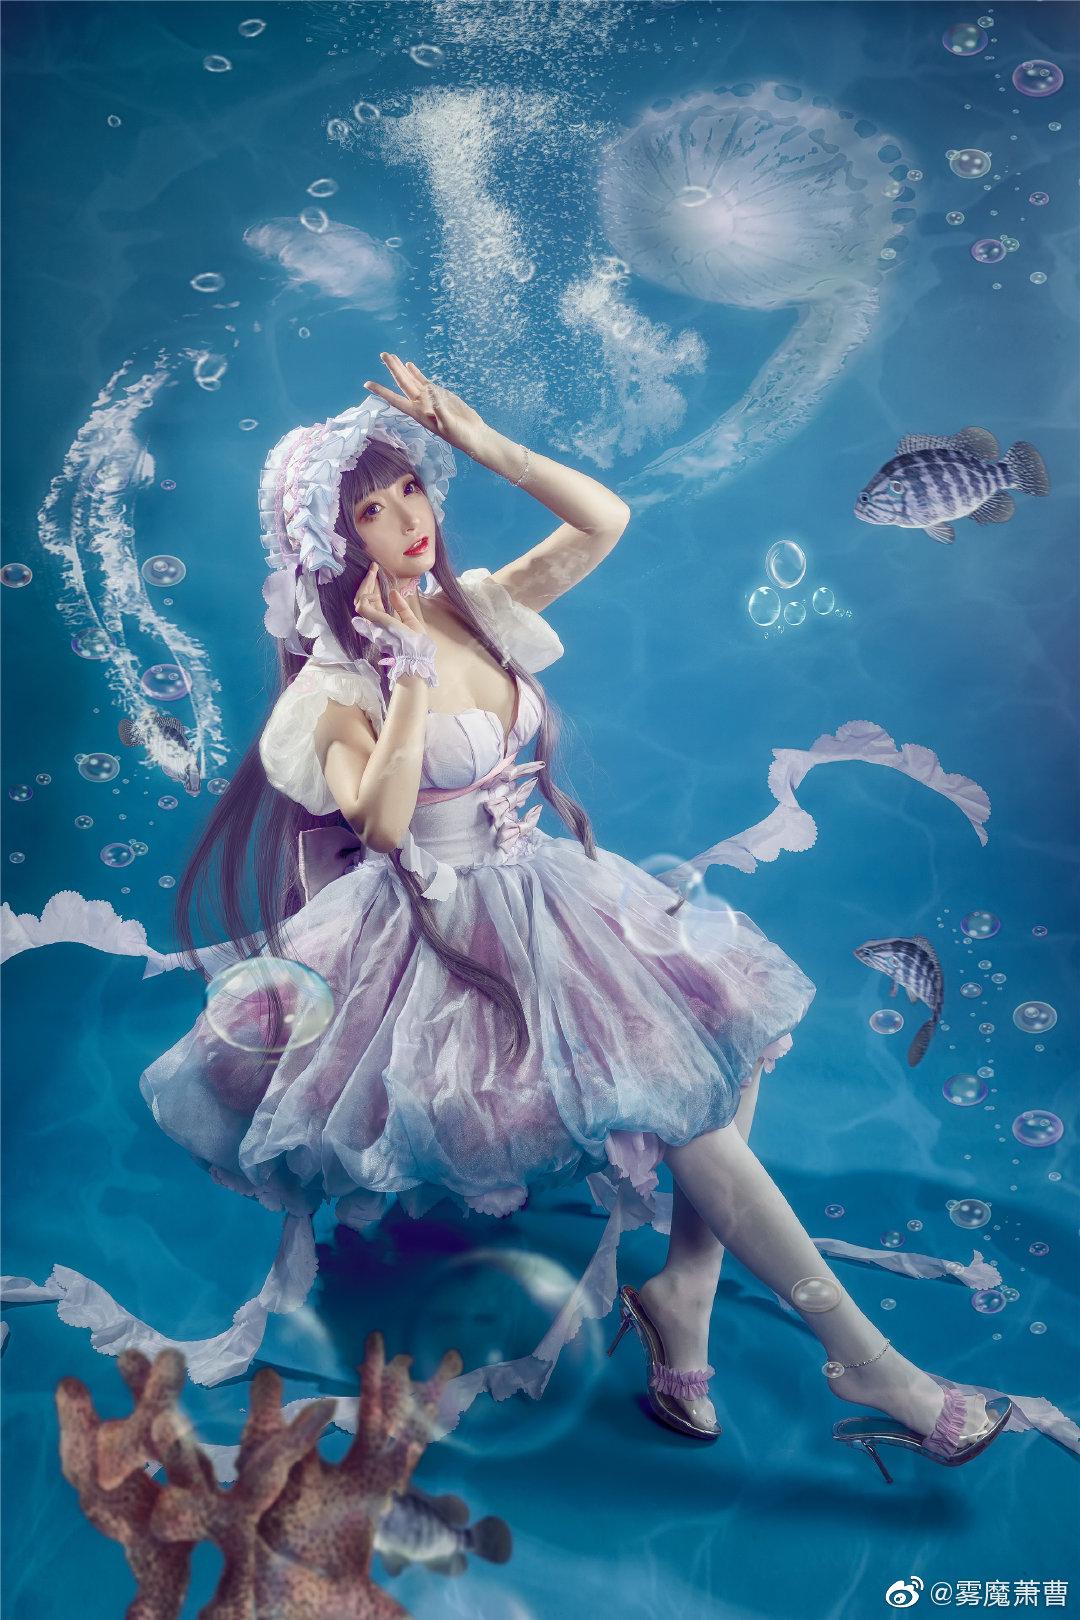 [COS]#魔卡少女樱# 大道寺知世 - 水之轮舞曲 COSPLAY-第10张